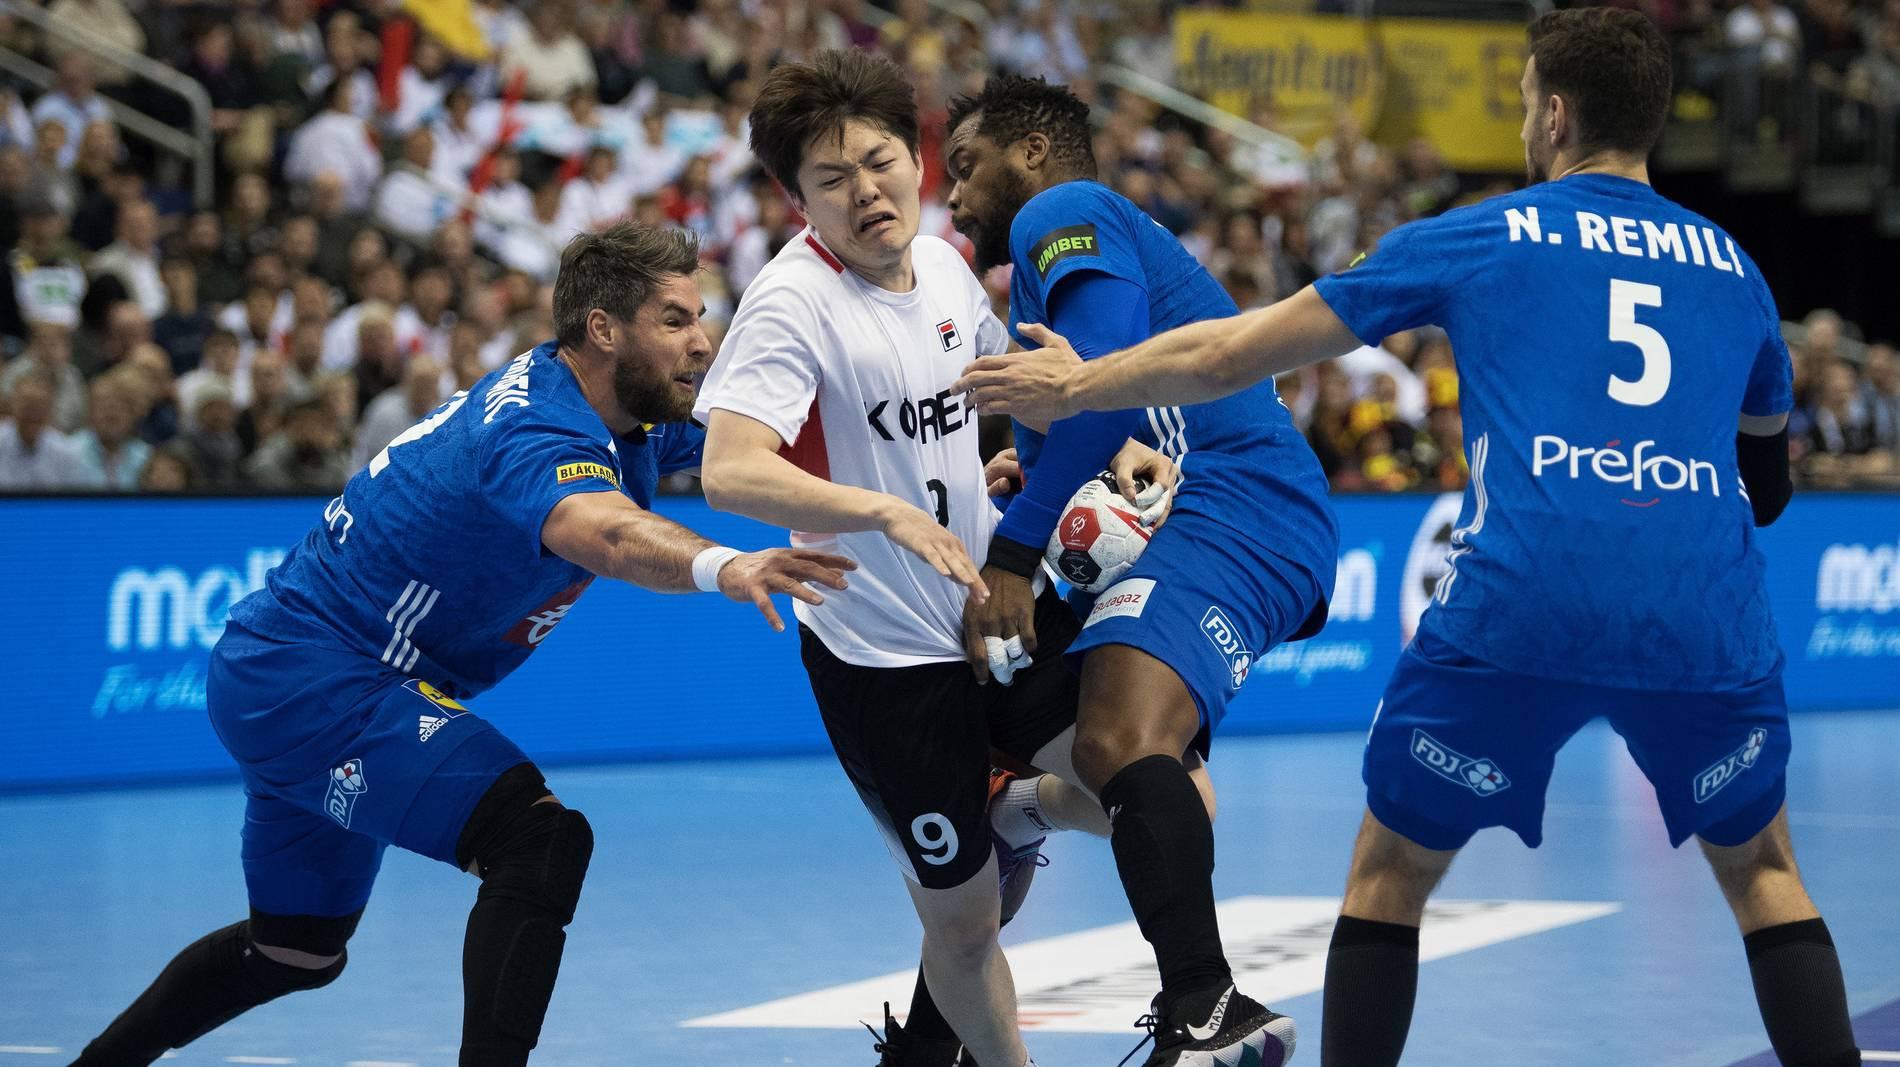 Handball Wm Hauptrunde Tabelle